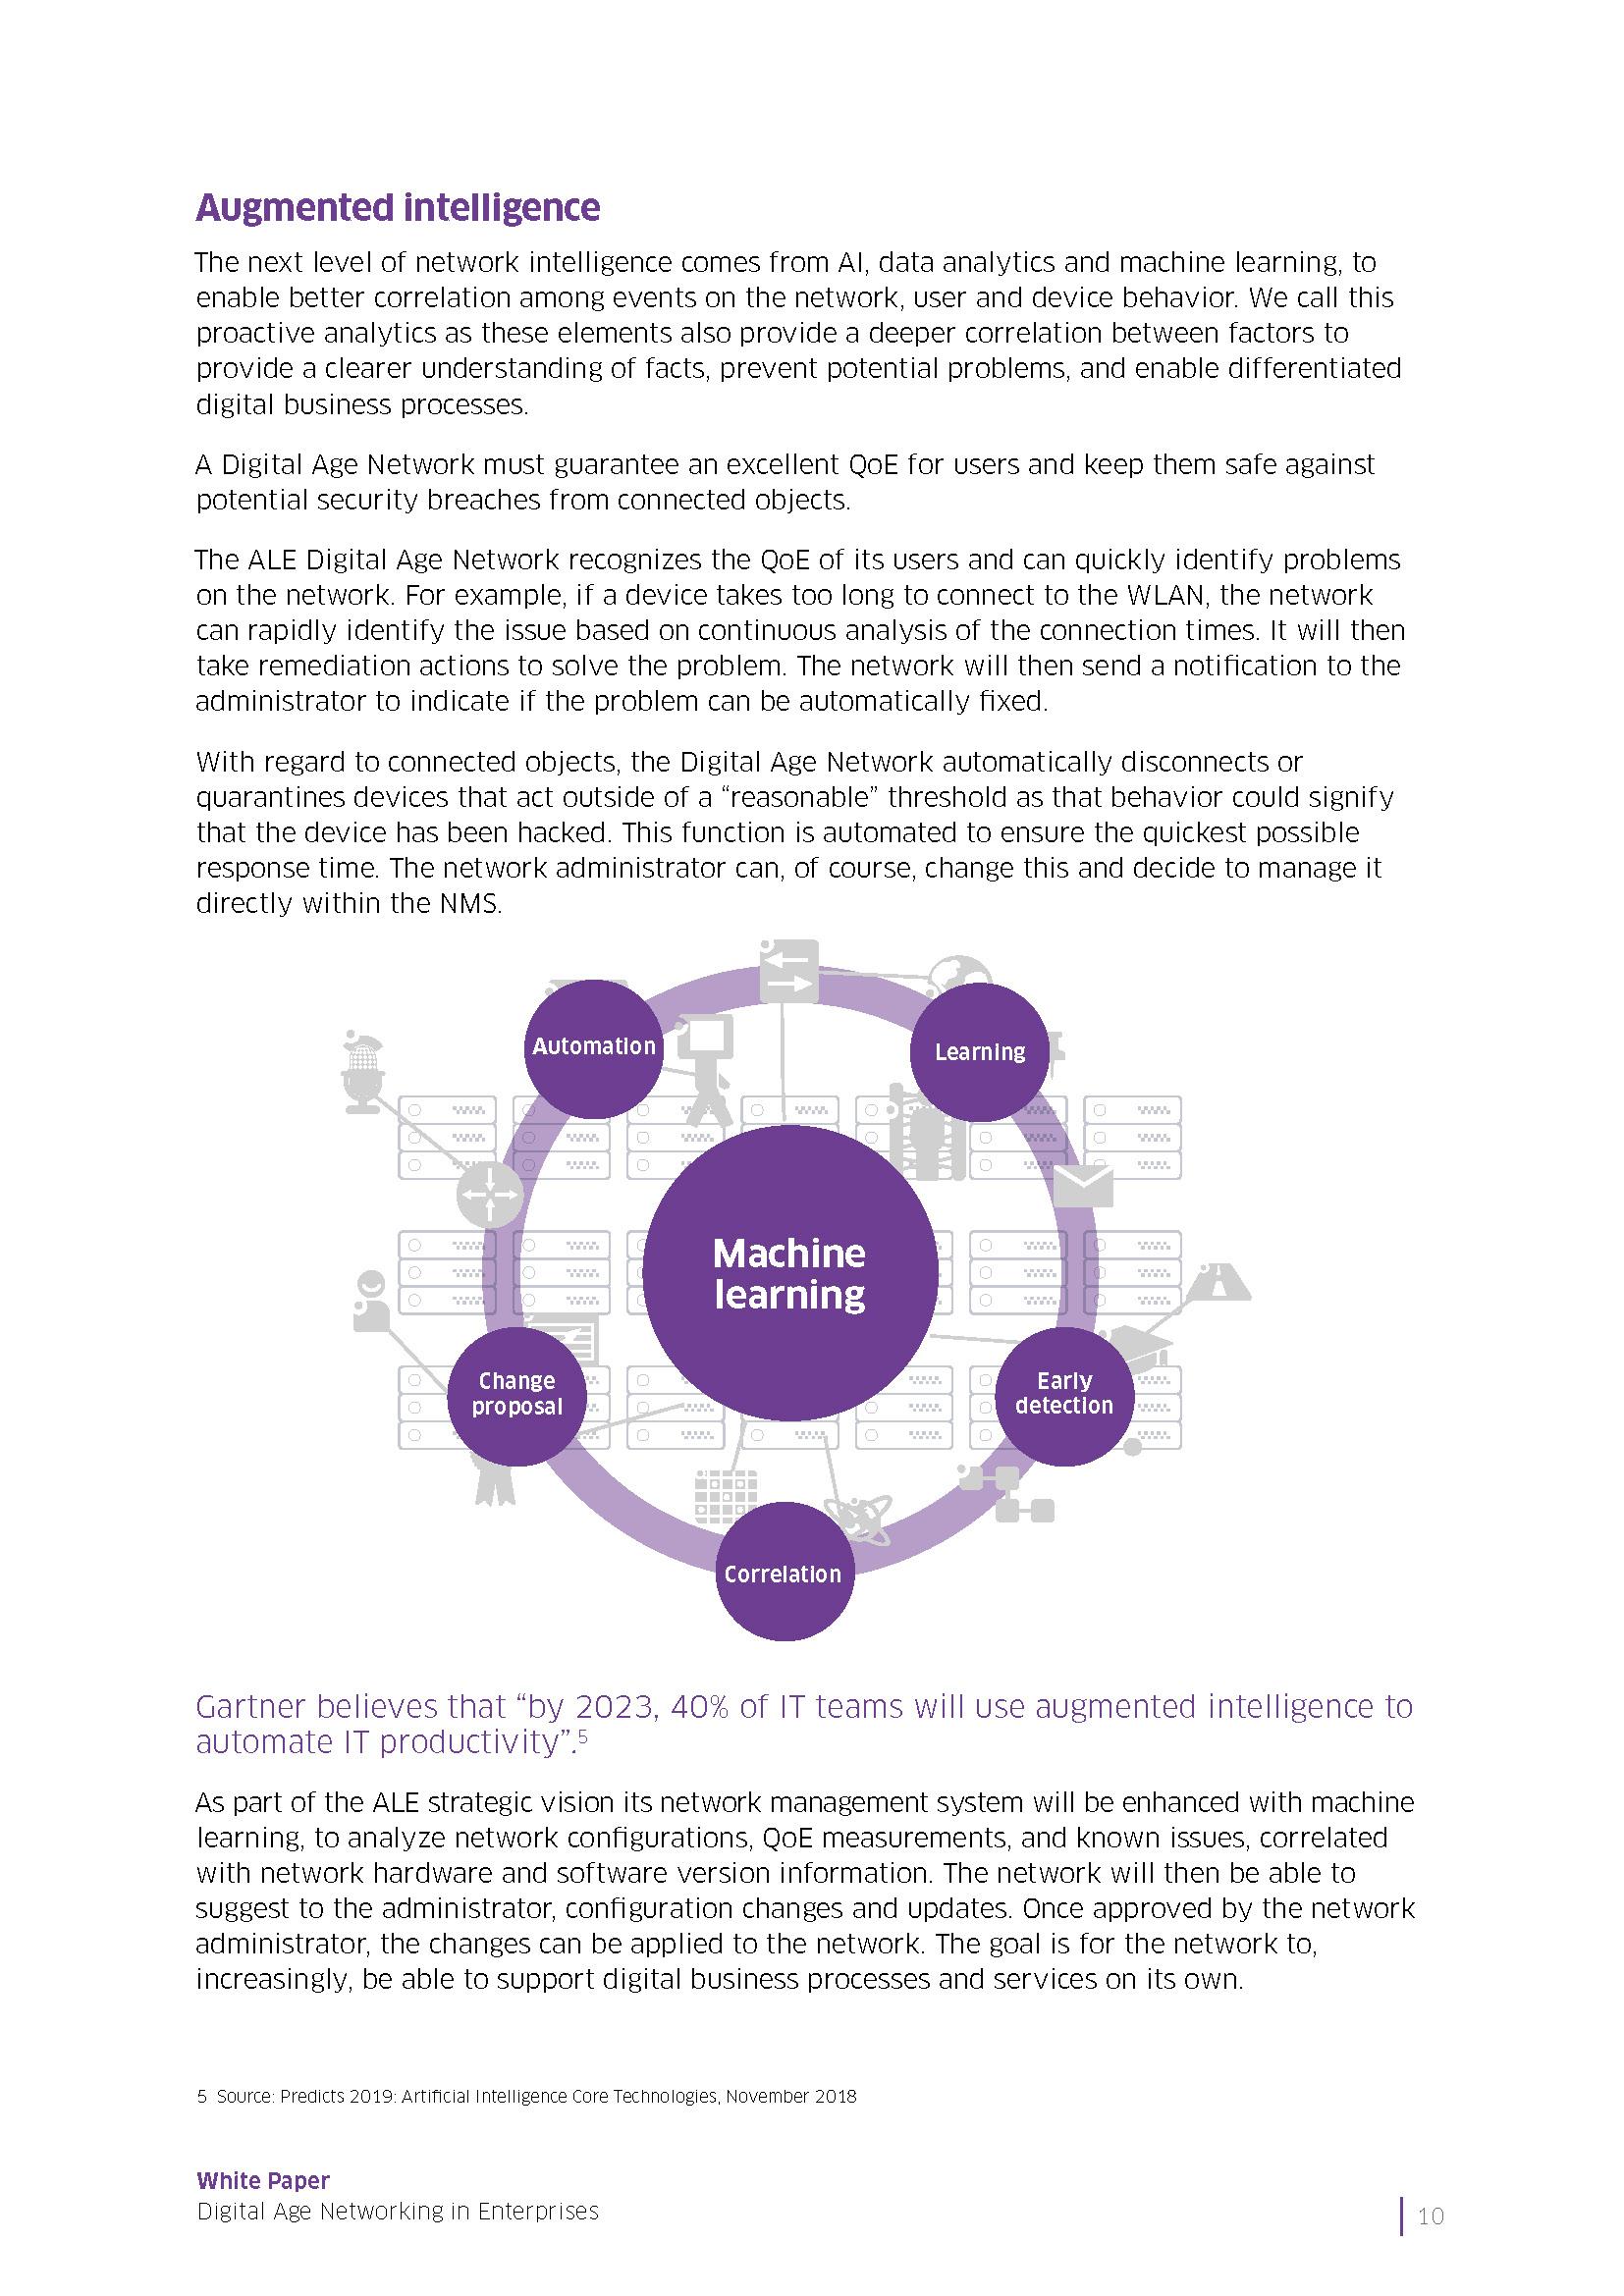 digital-age-networking-enterprises_Page_10